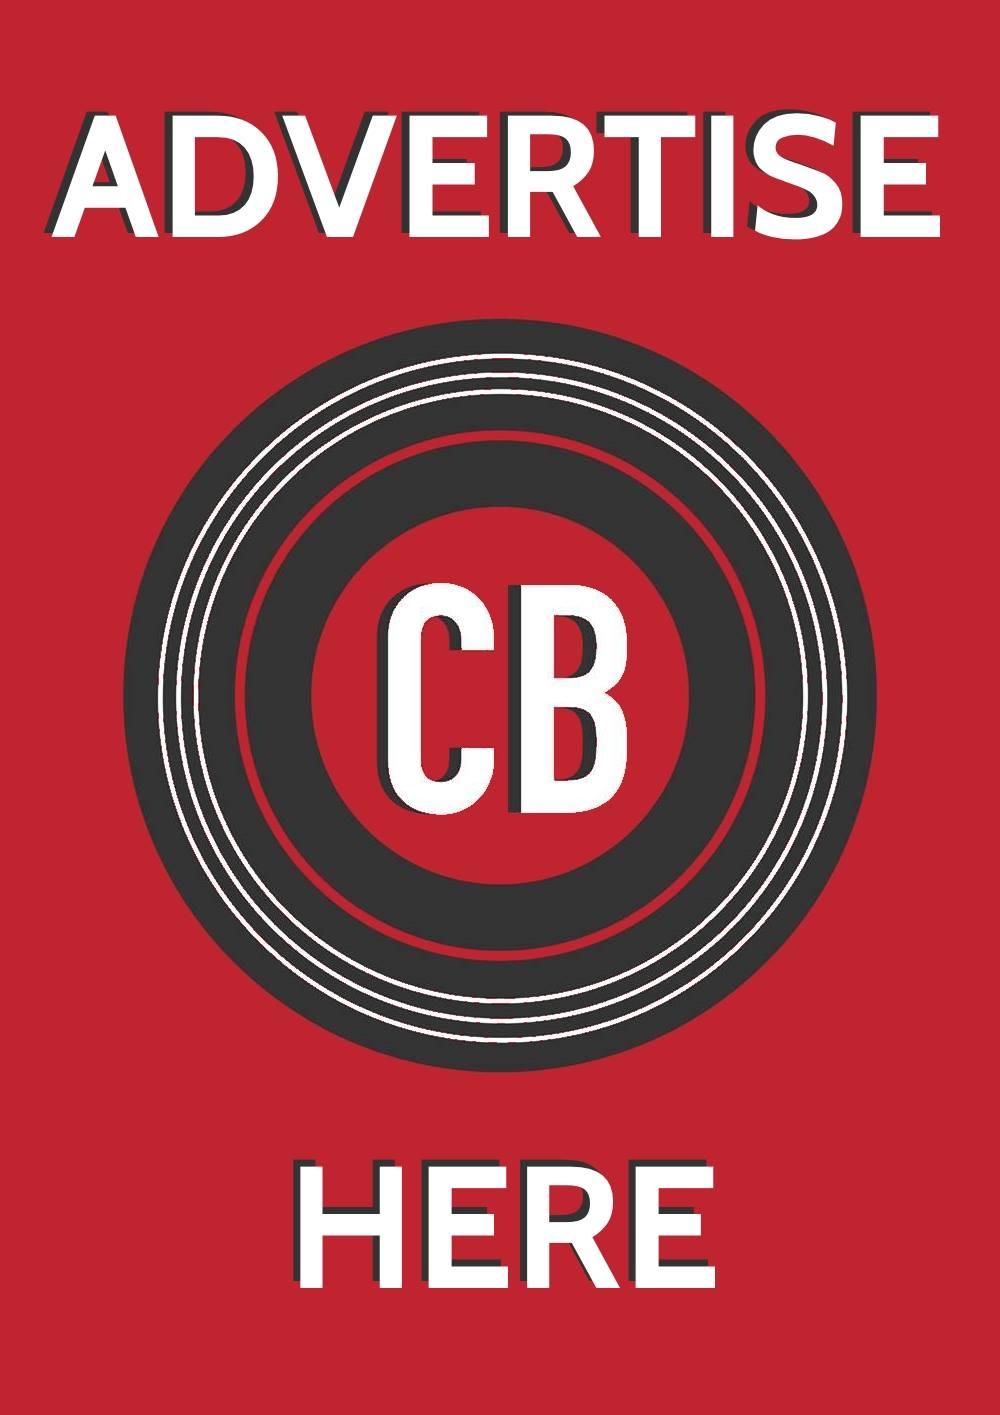 Advertise on Chordblossom